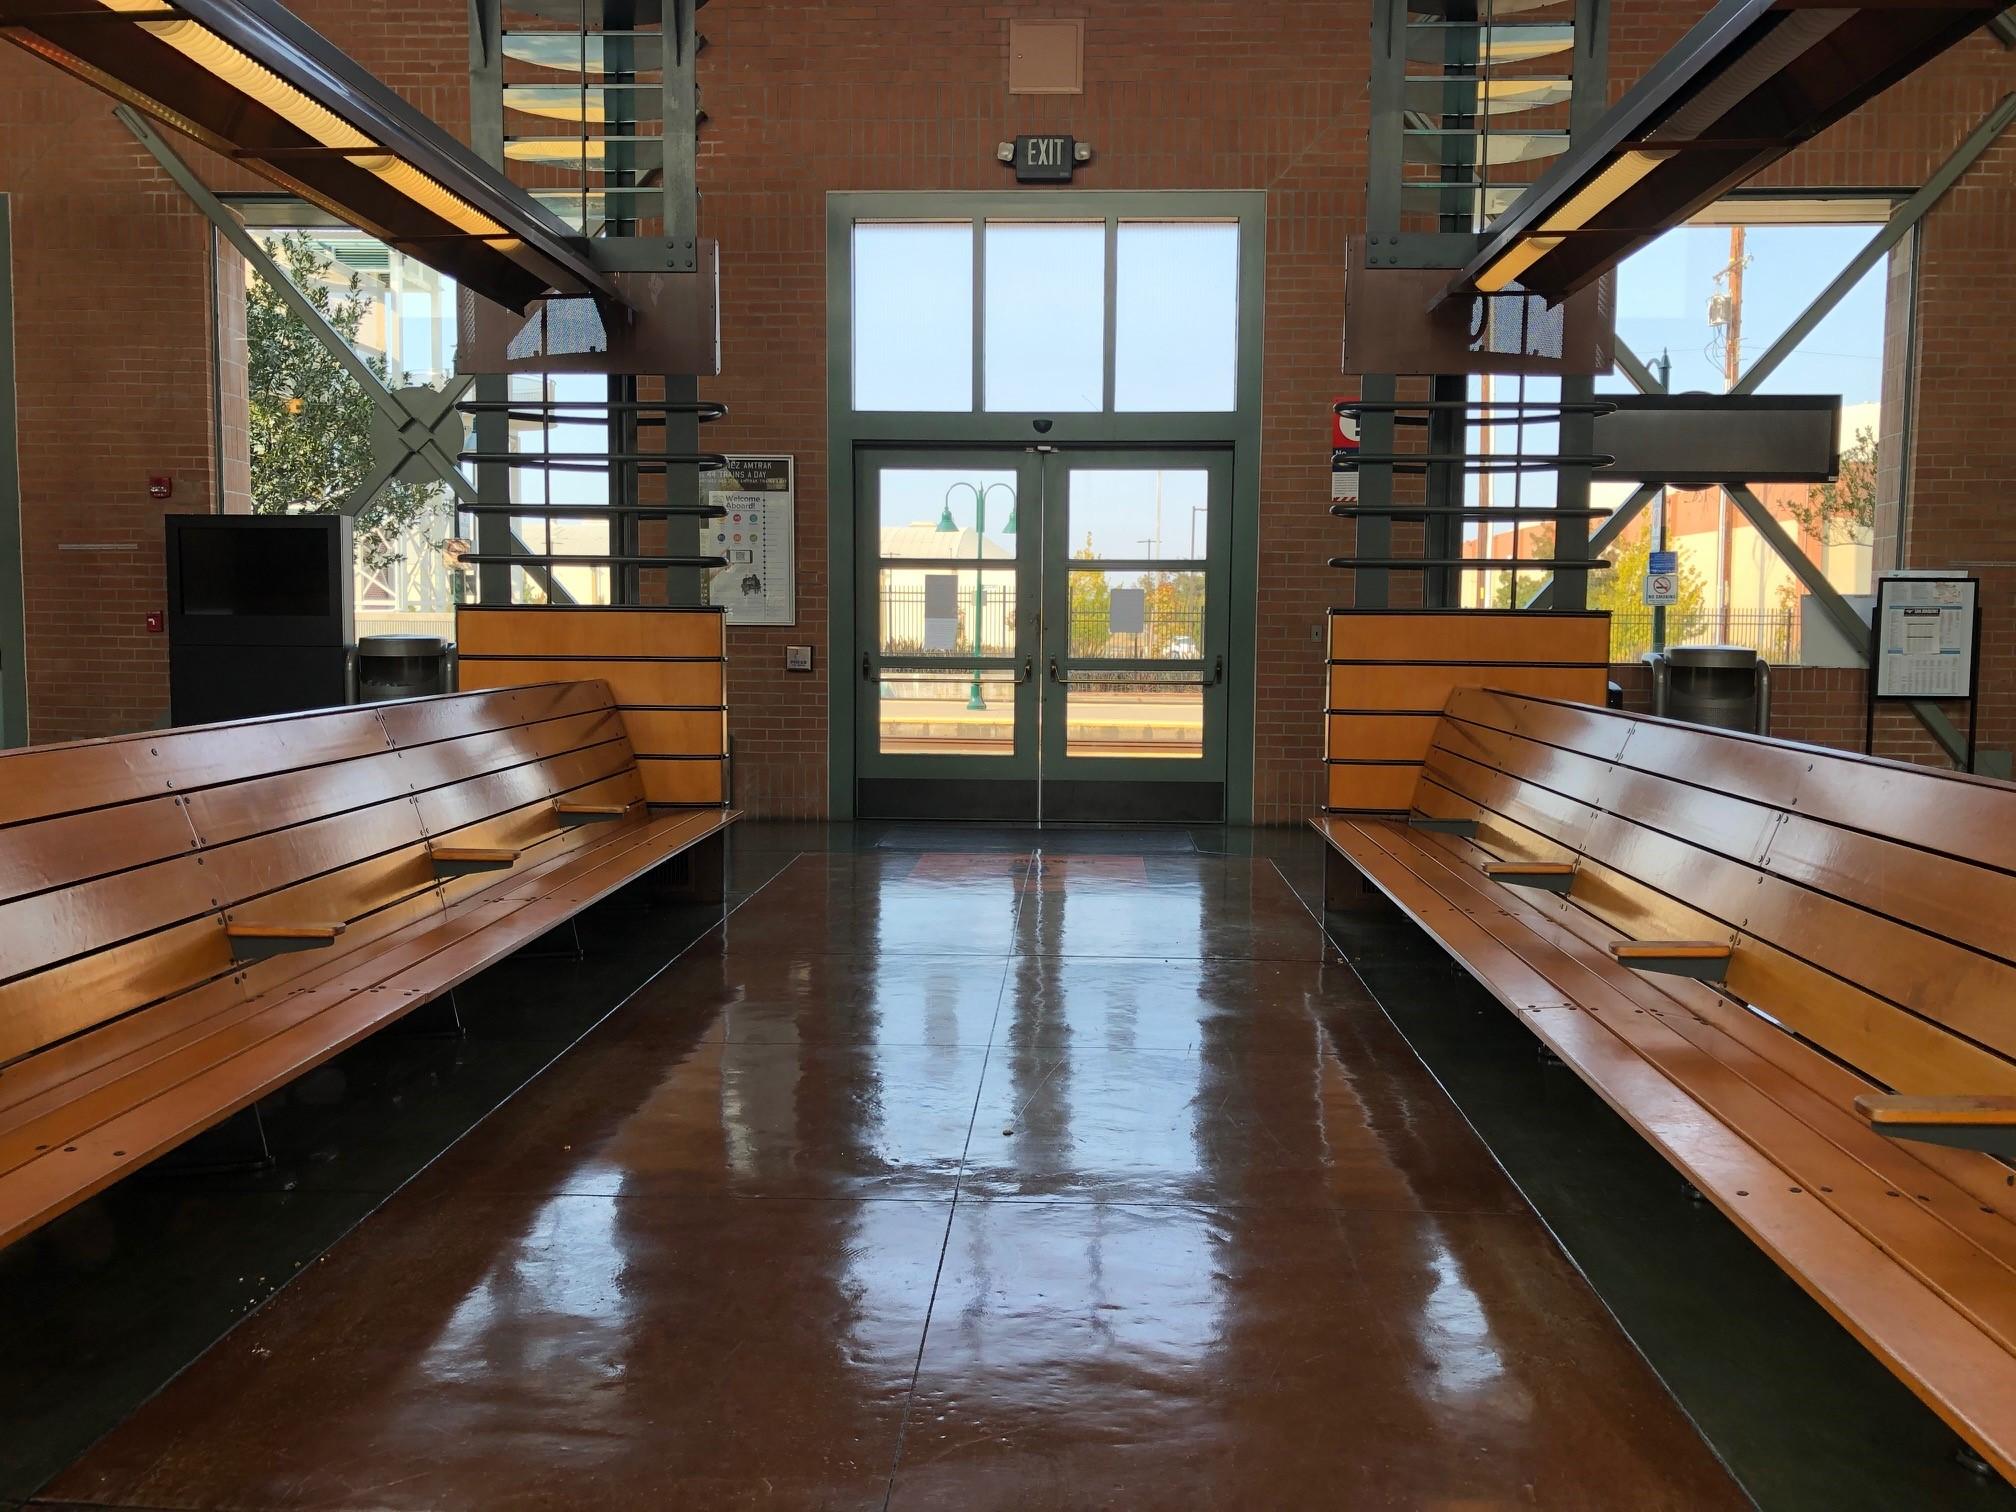 Inside of Martinez station